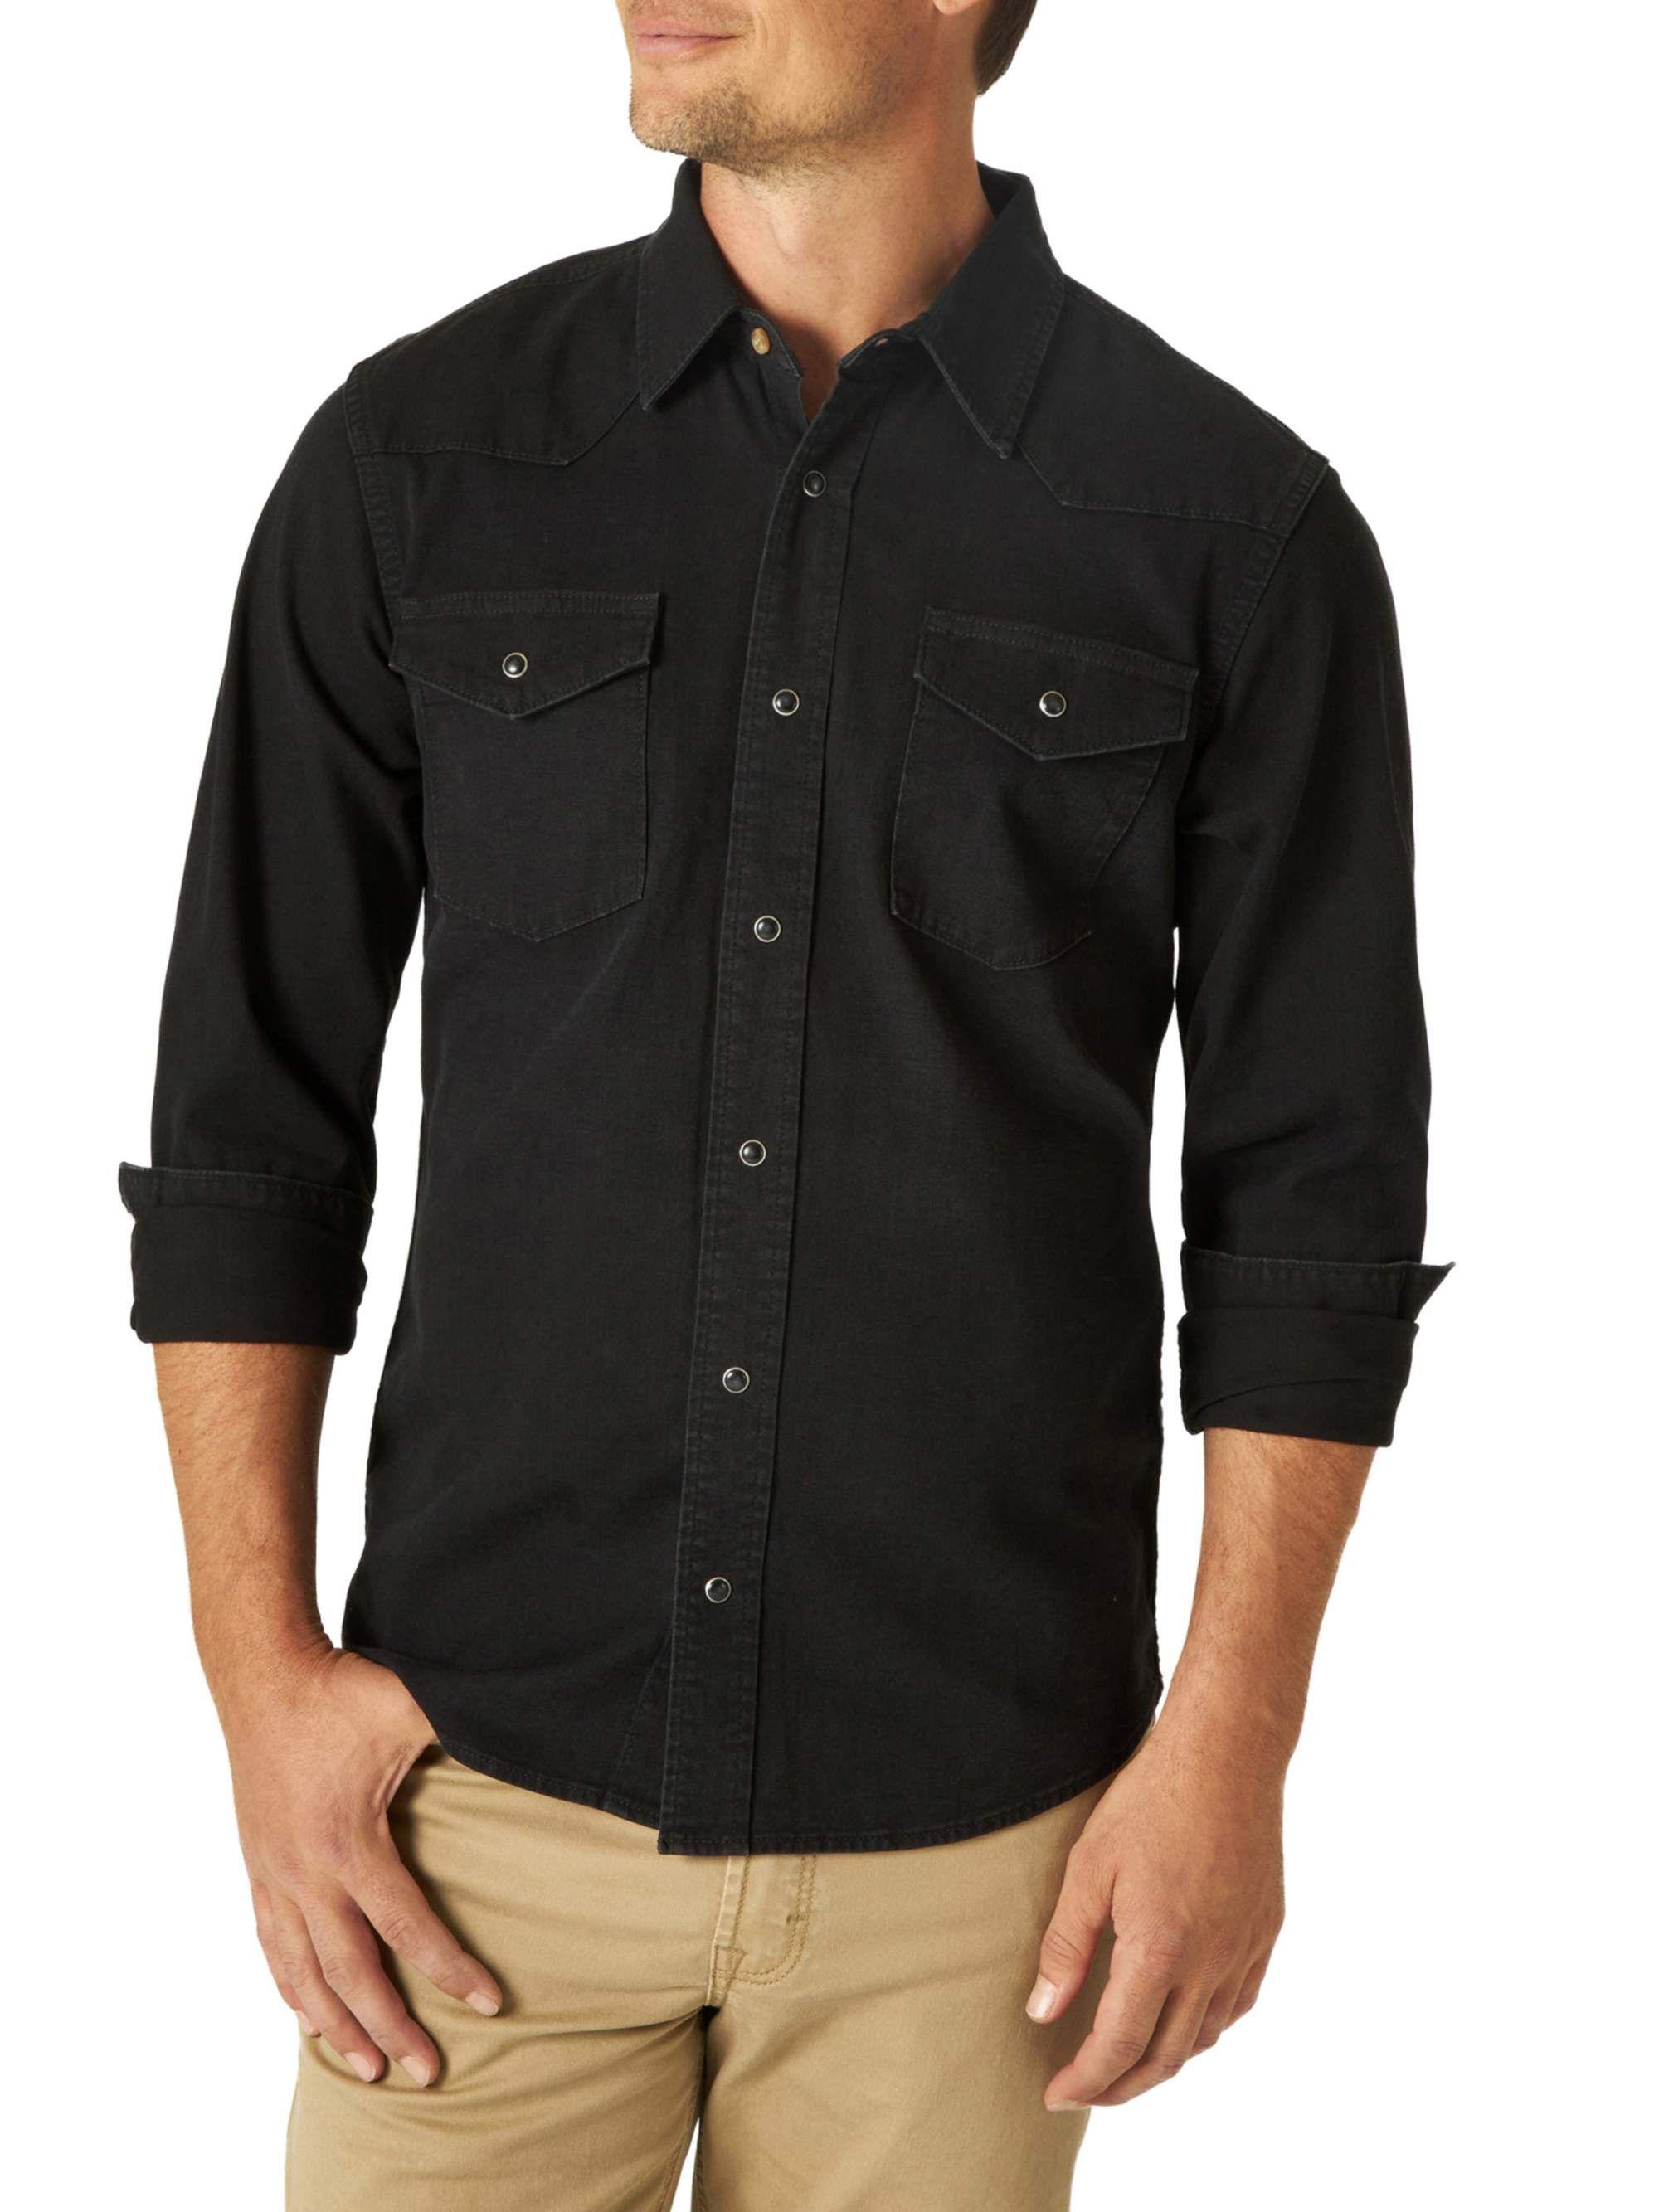 Wrangler Wrangler Men S Premium Slim Fit Denim Shirt Walmart Com In 2021 Fitted Denim Shirt Shirt Outfit Men Mens Outfits Dressy [ 2667 x 2000 Pixel ]